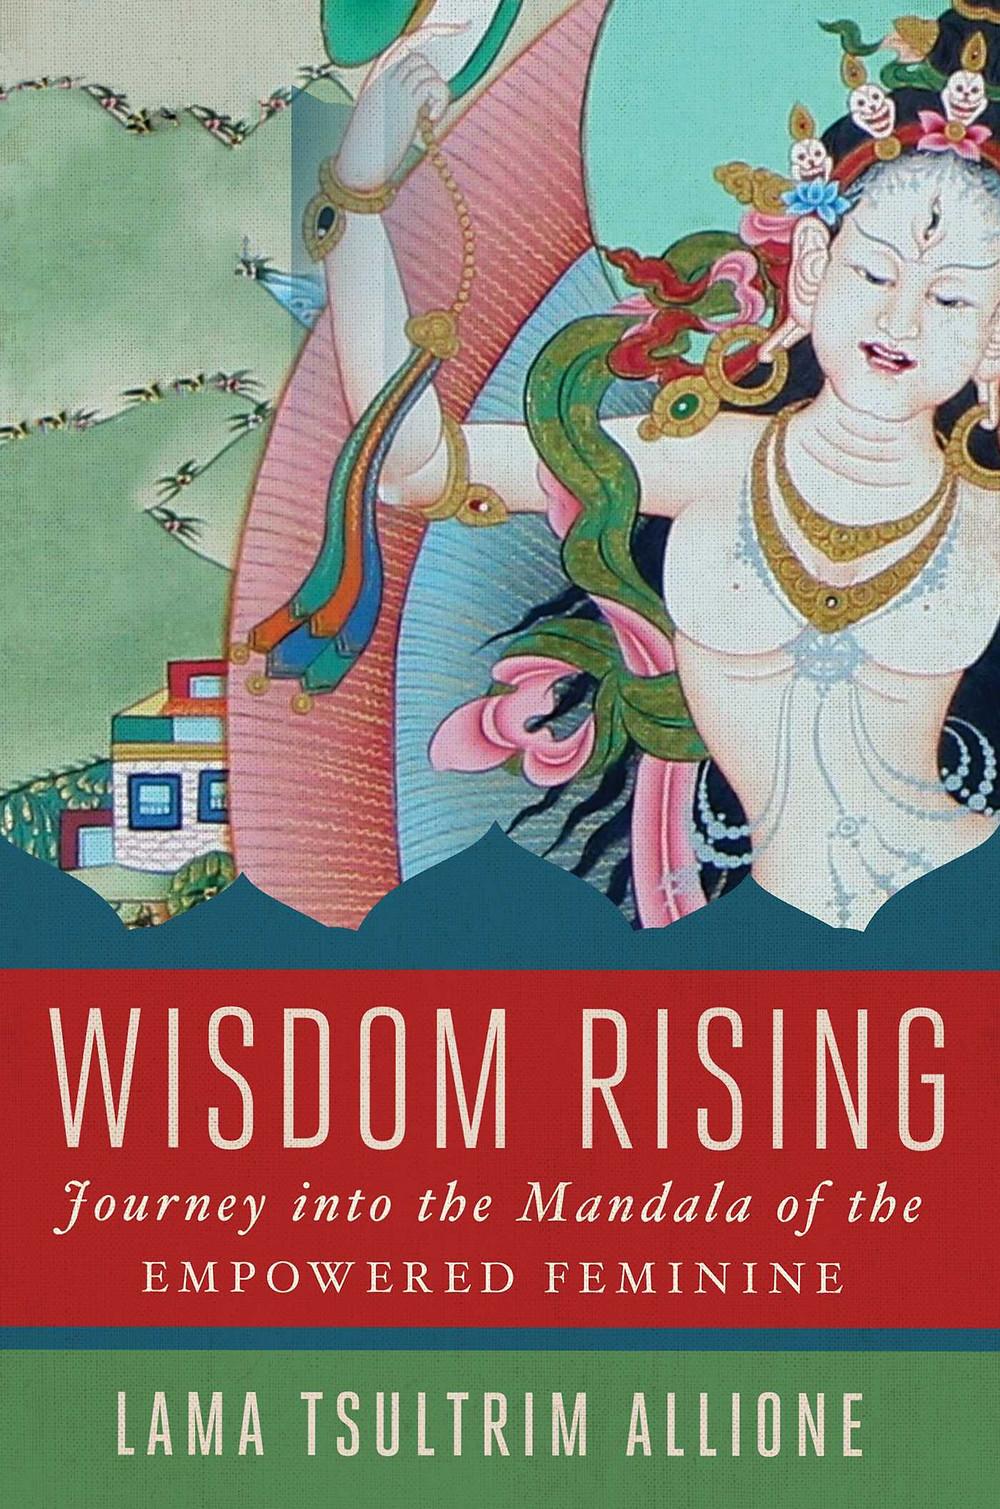 Wisdom Rising: Journey into the Mandala of the Empowered Feminine by Lama Tsultrim Allione, 2018.